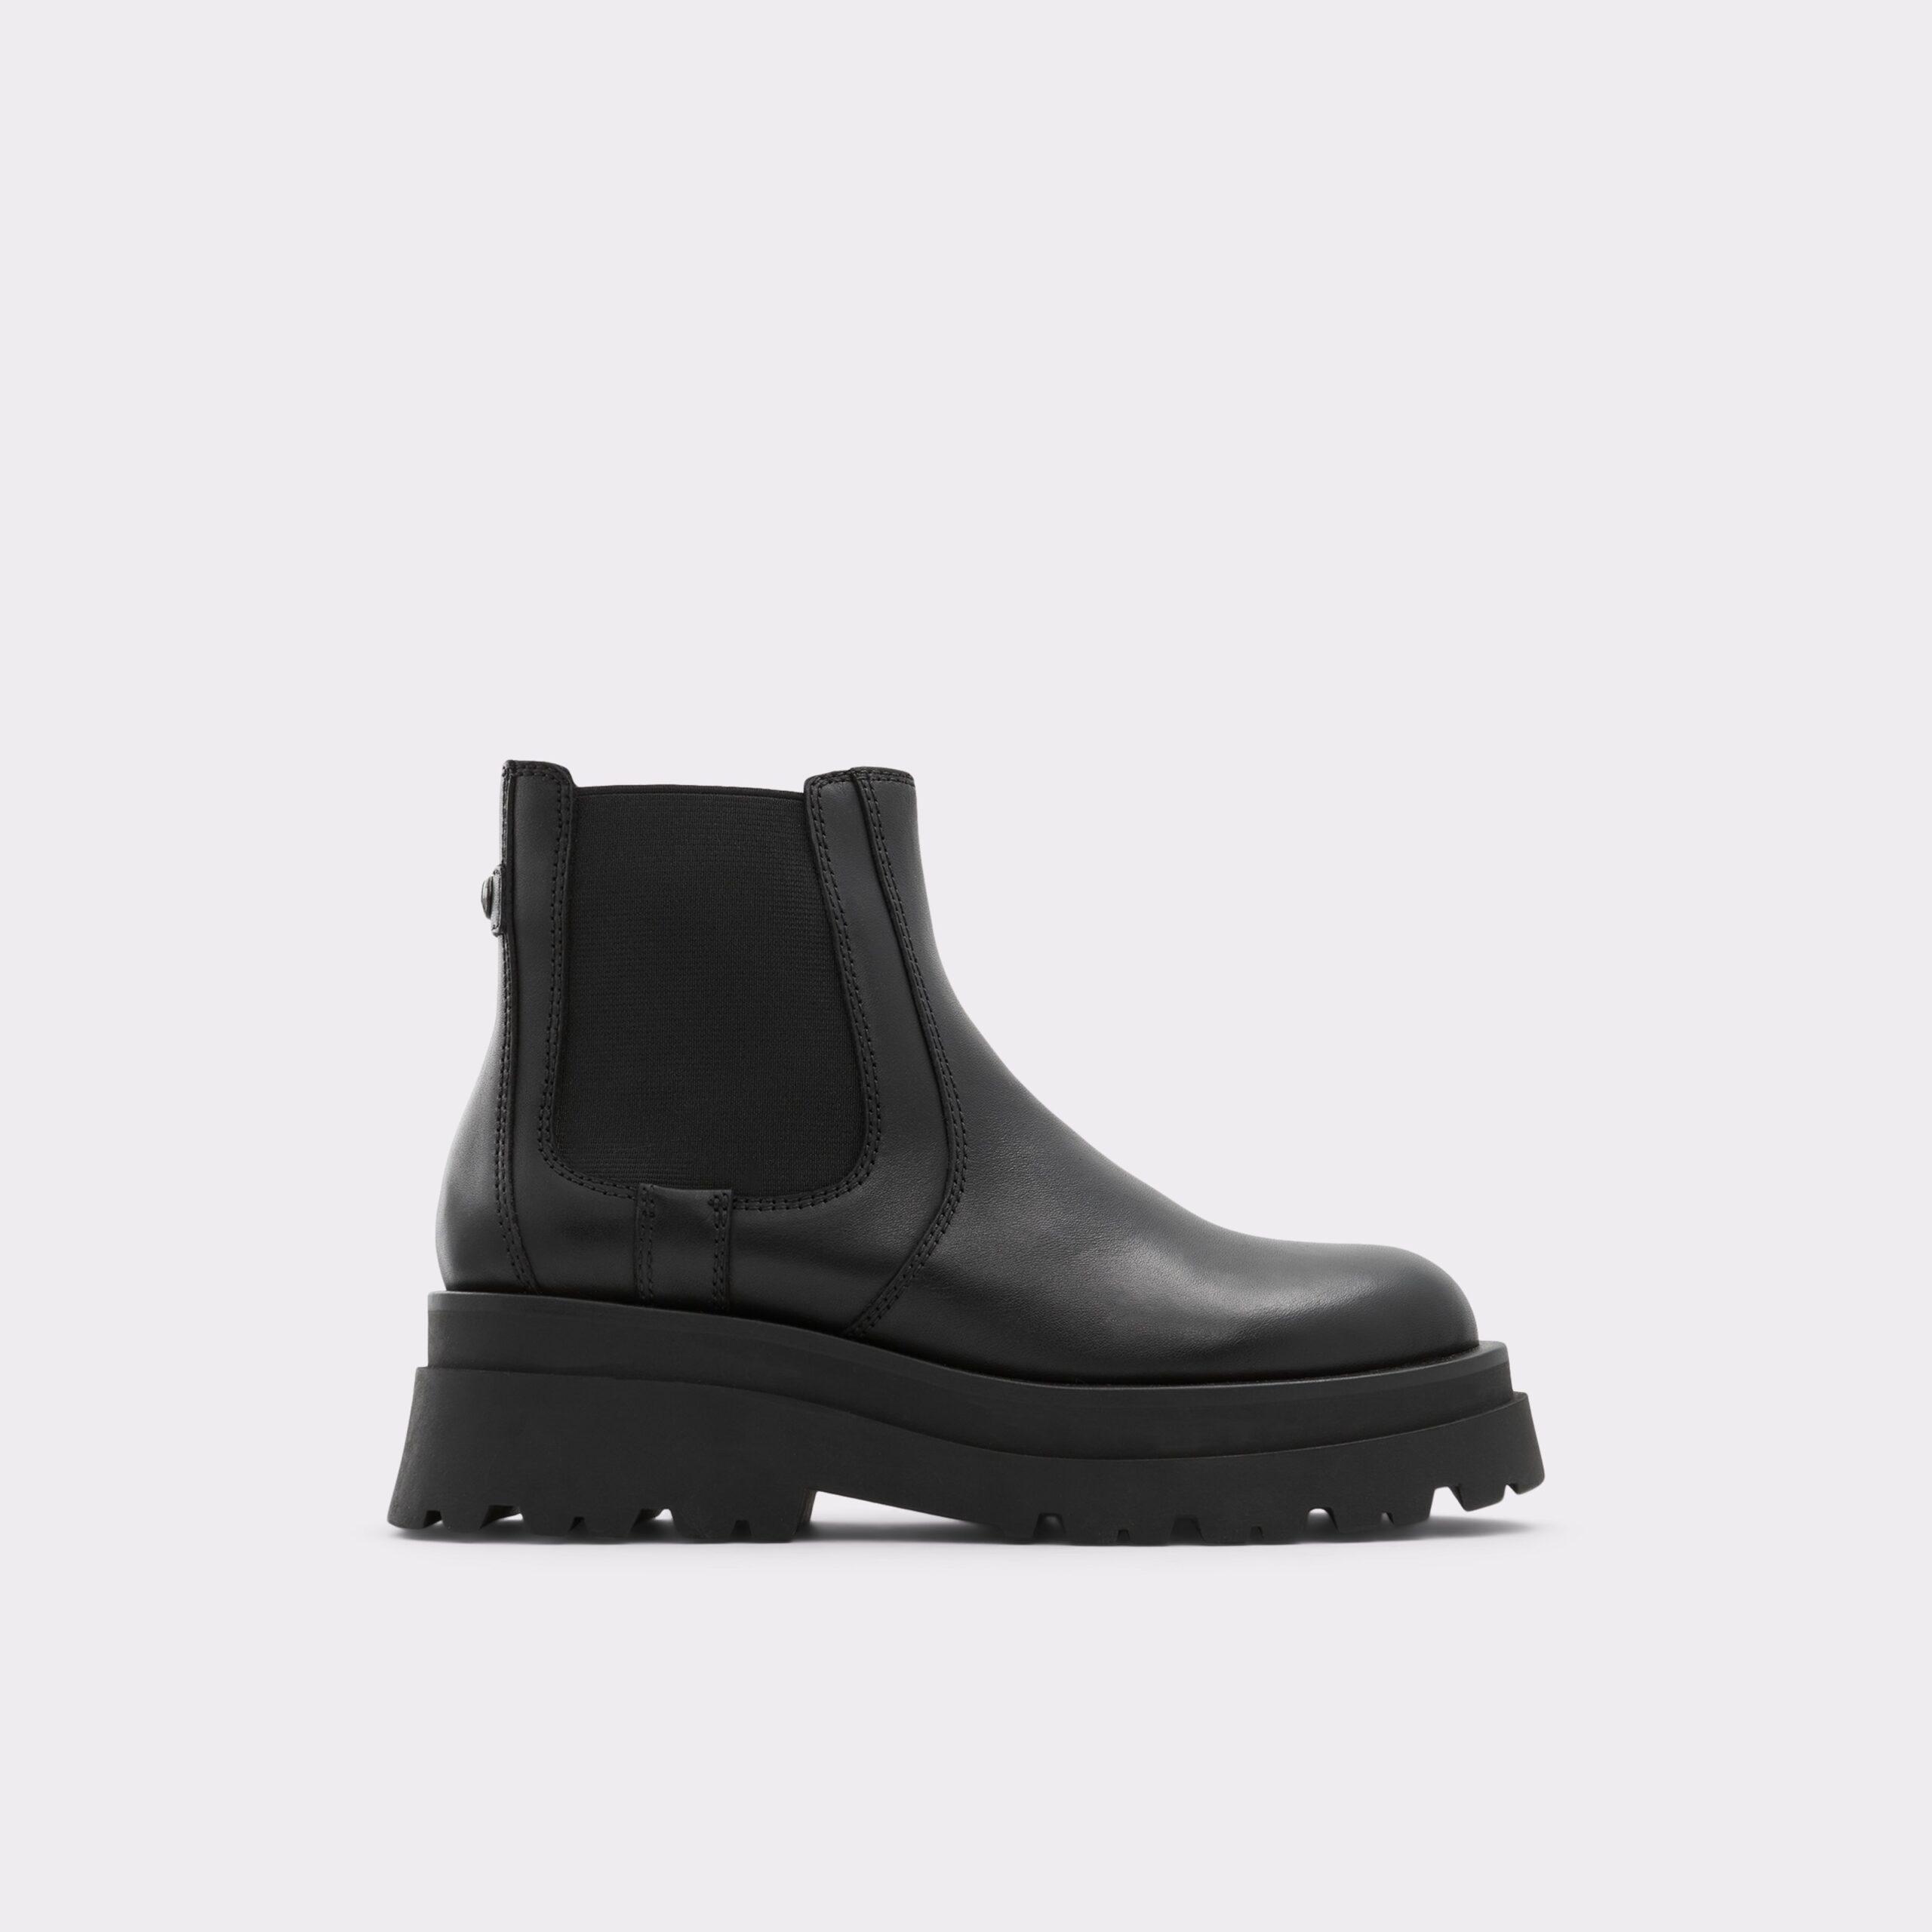 Black Ankle Block Heel Boots from Aldo